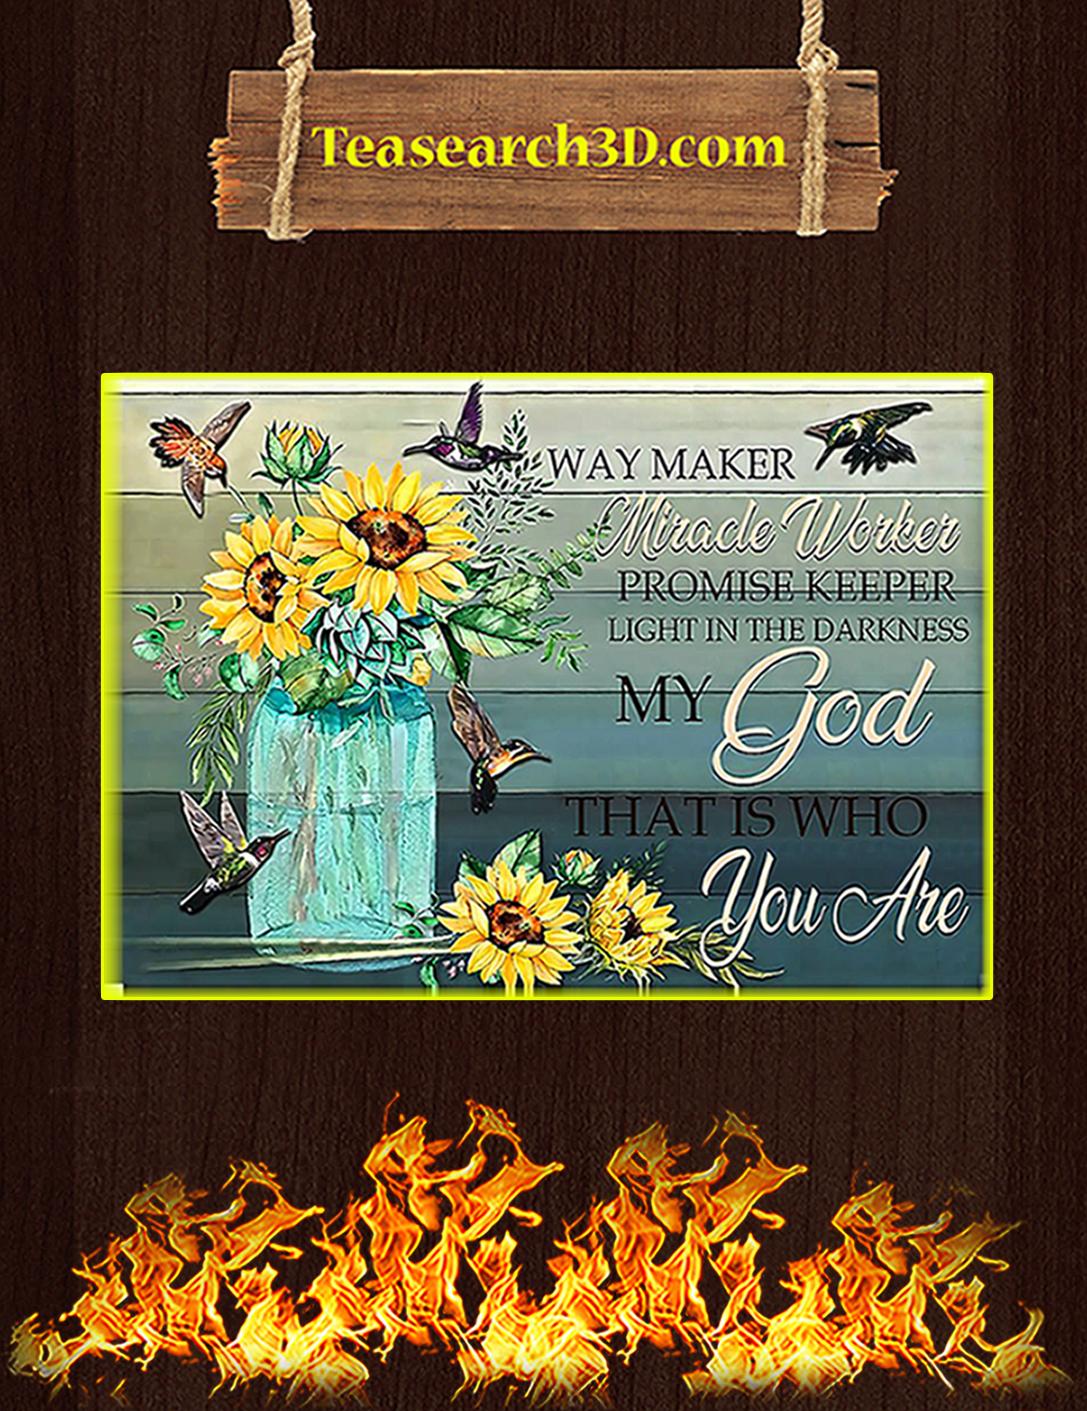 Hummingbird sunflower way maker miracle worker poster A2